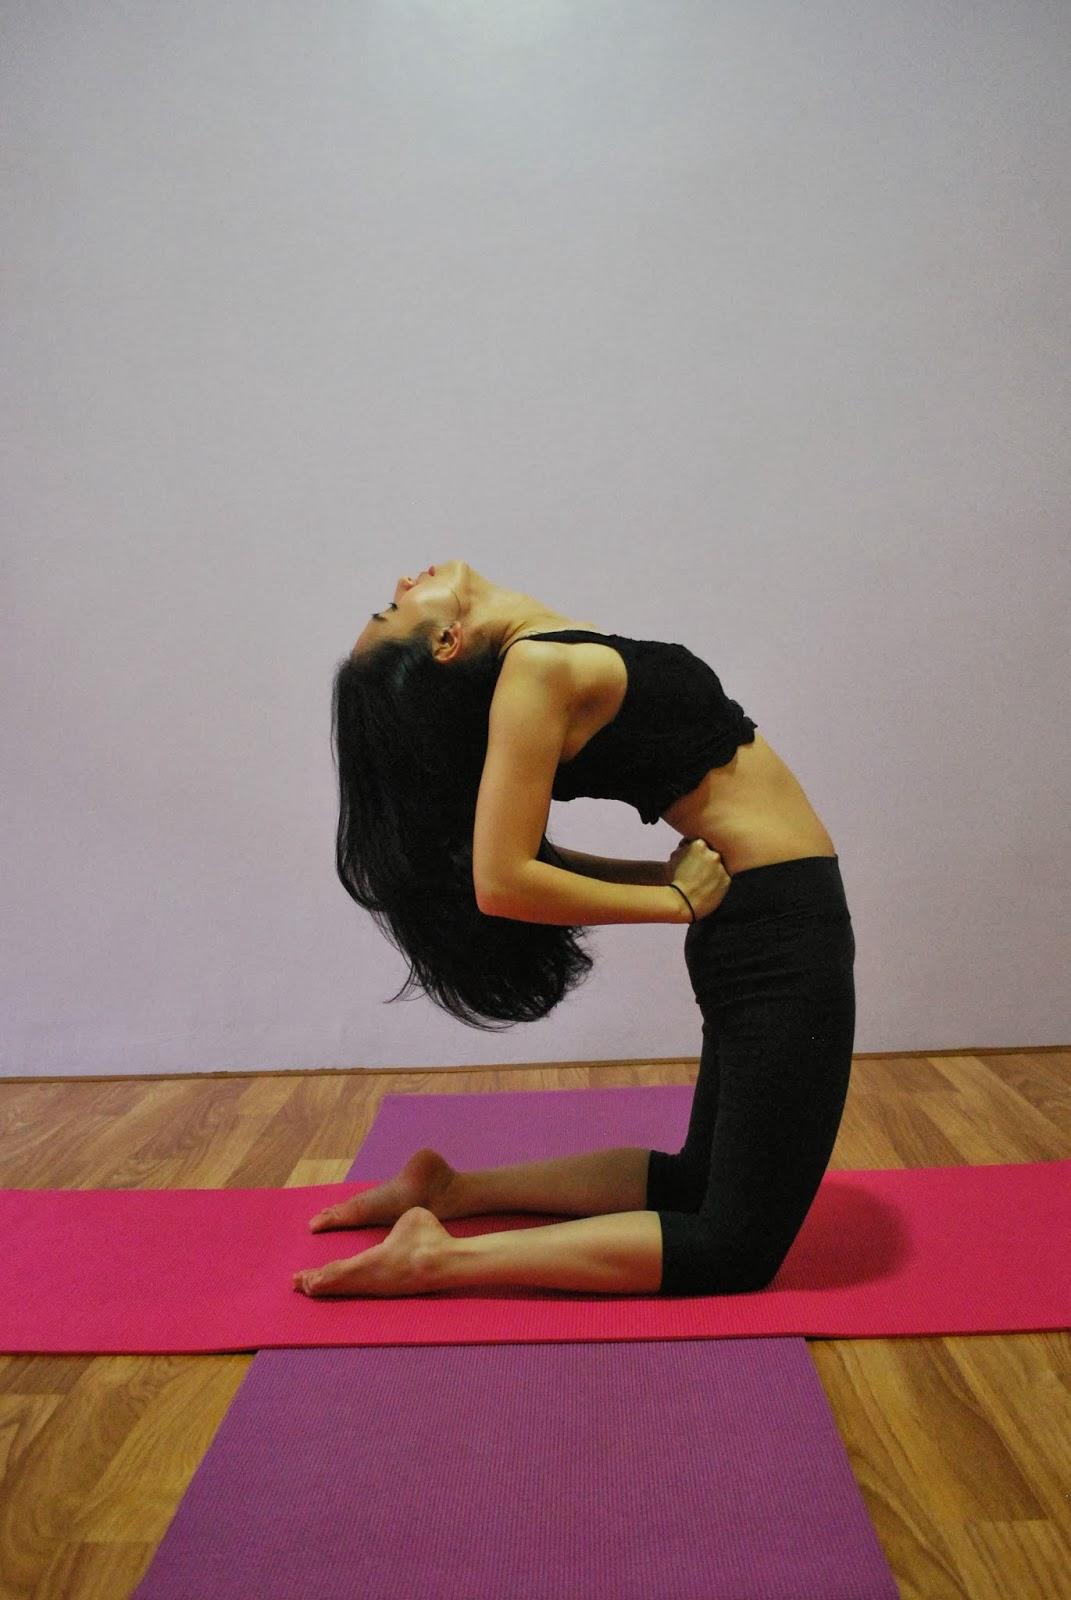 Karmarati Yoga Personal Practice Strengthening Legs and